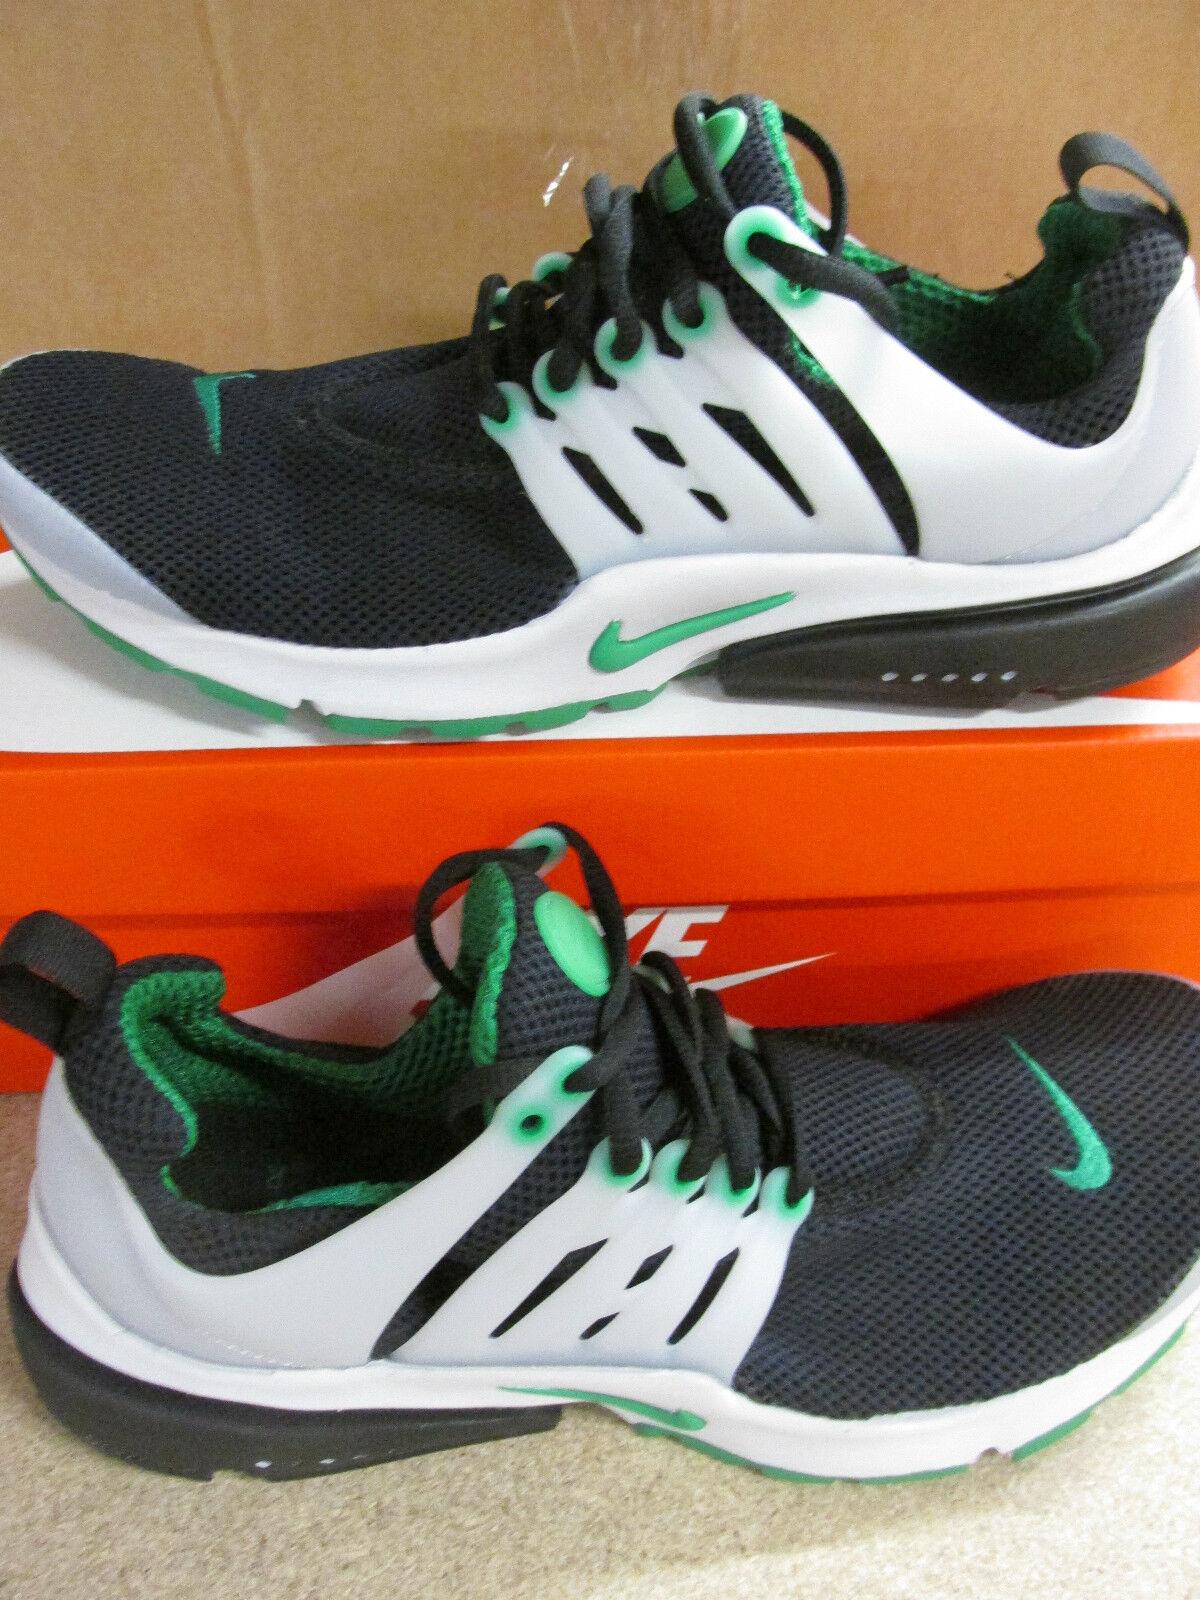 nike air presto mens essential mens presto running trainers 848187 003 sneakers shoes 7fbc18